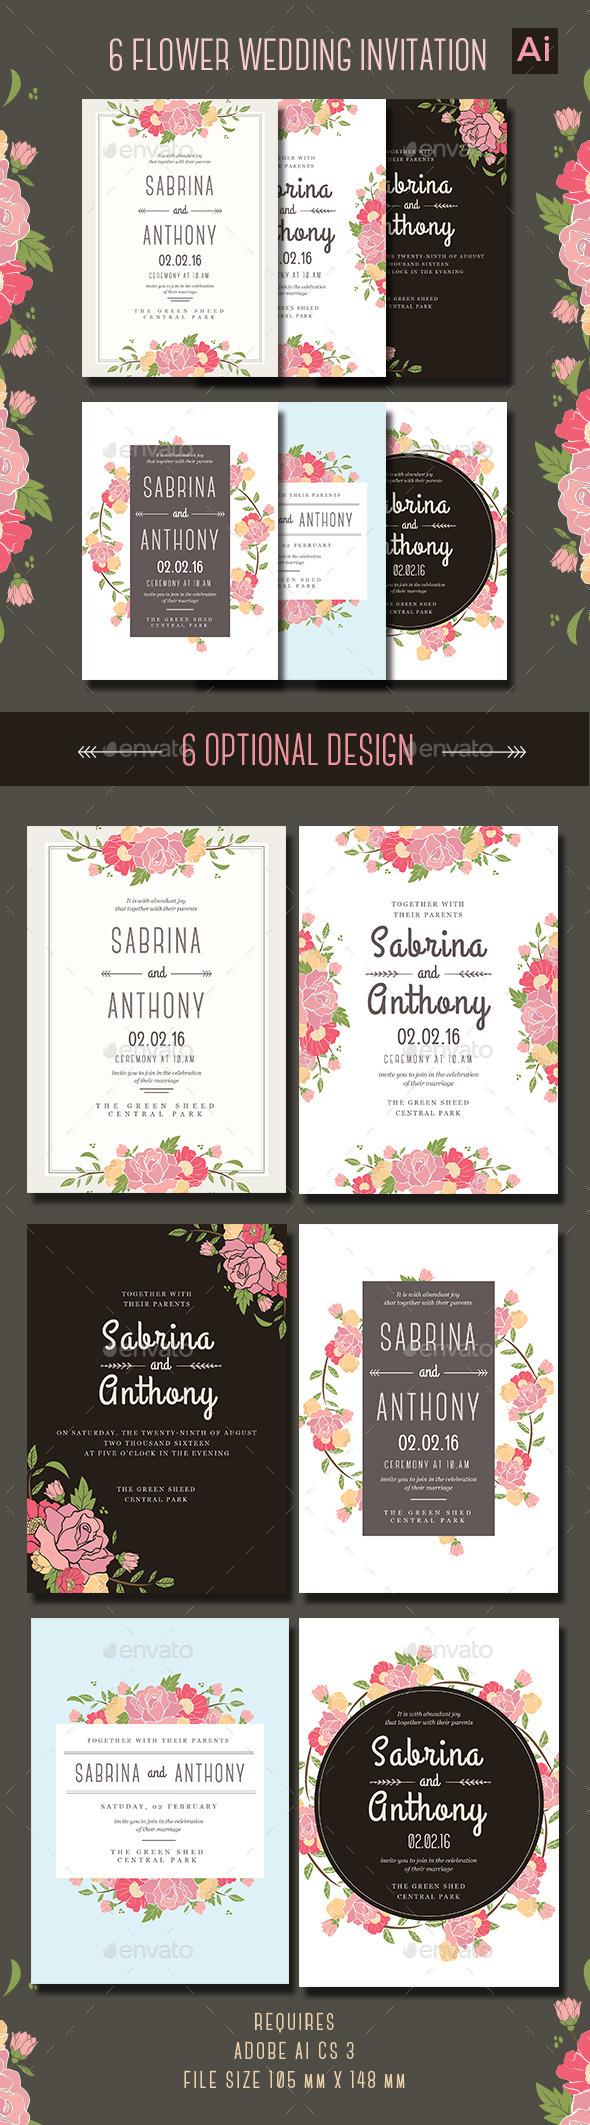 6 Floral Wedding Invitation - Weddings Cards & Invites